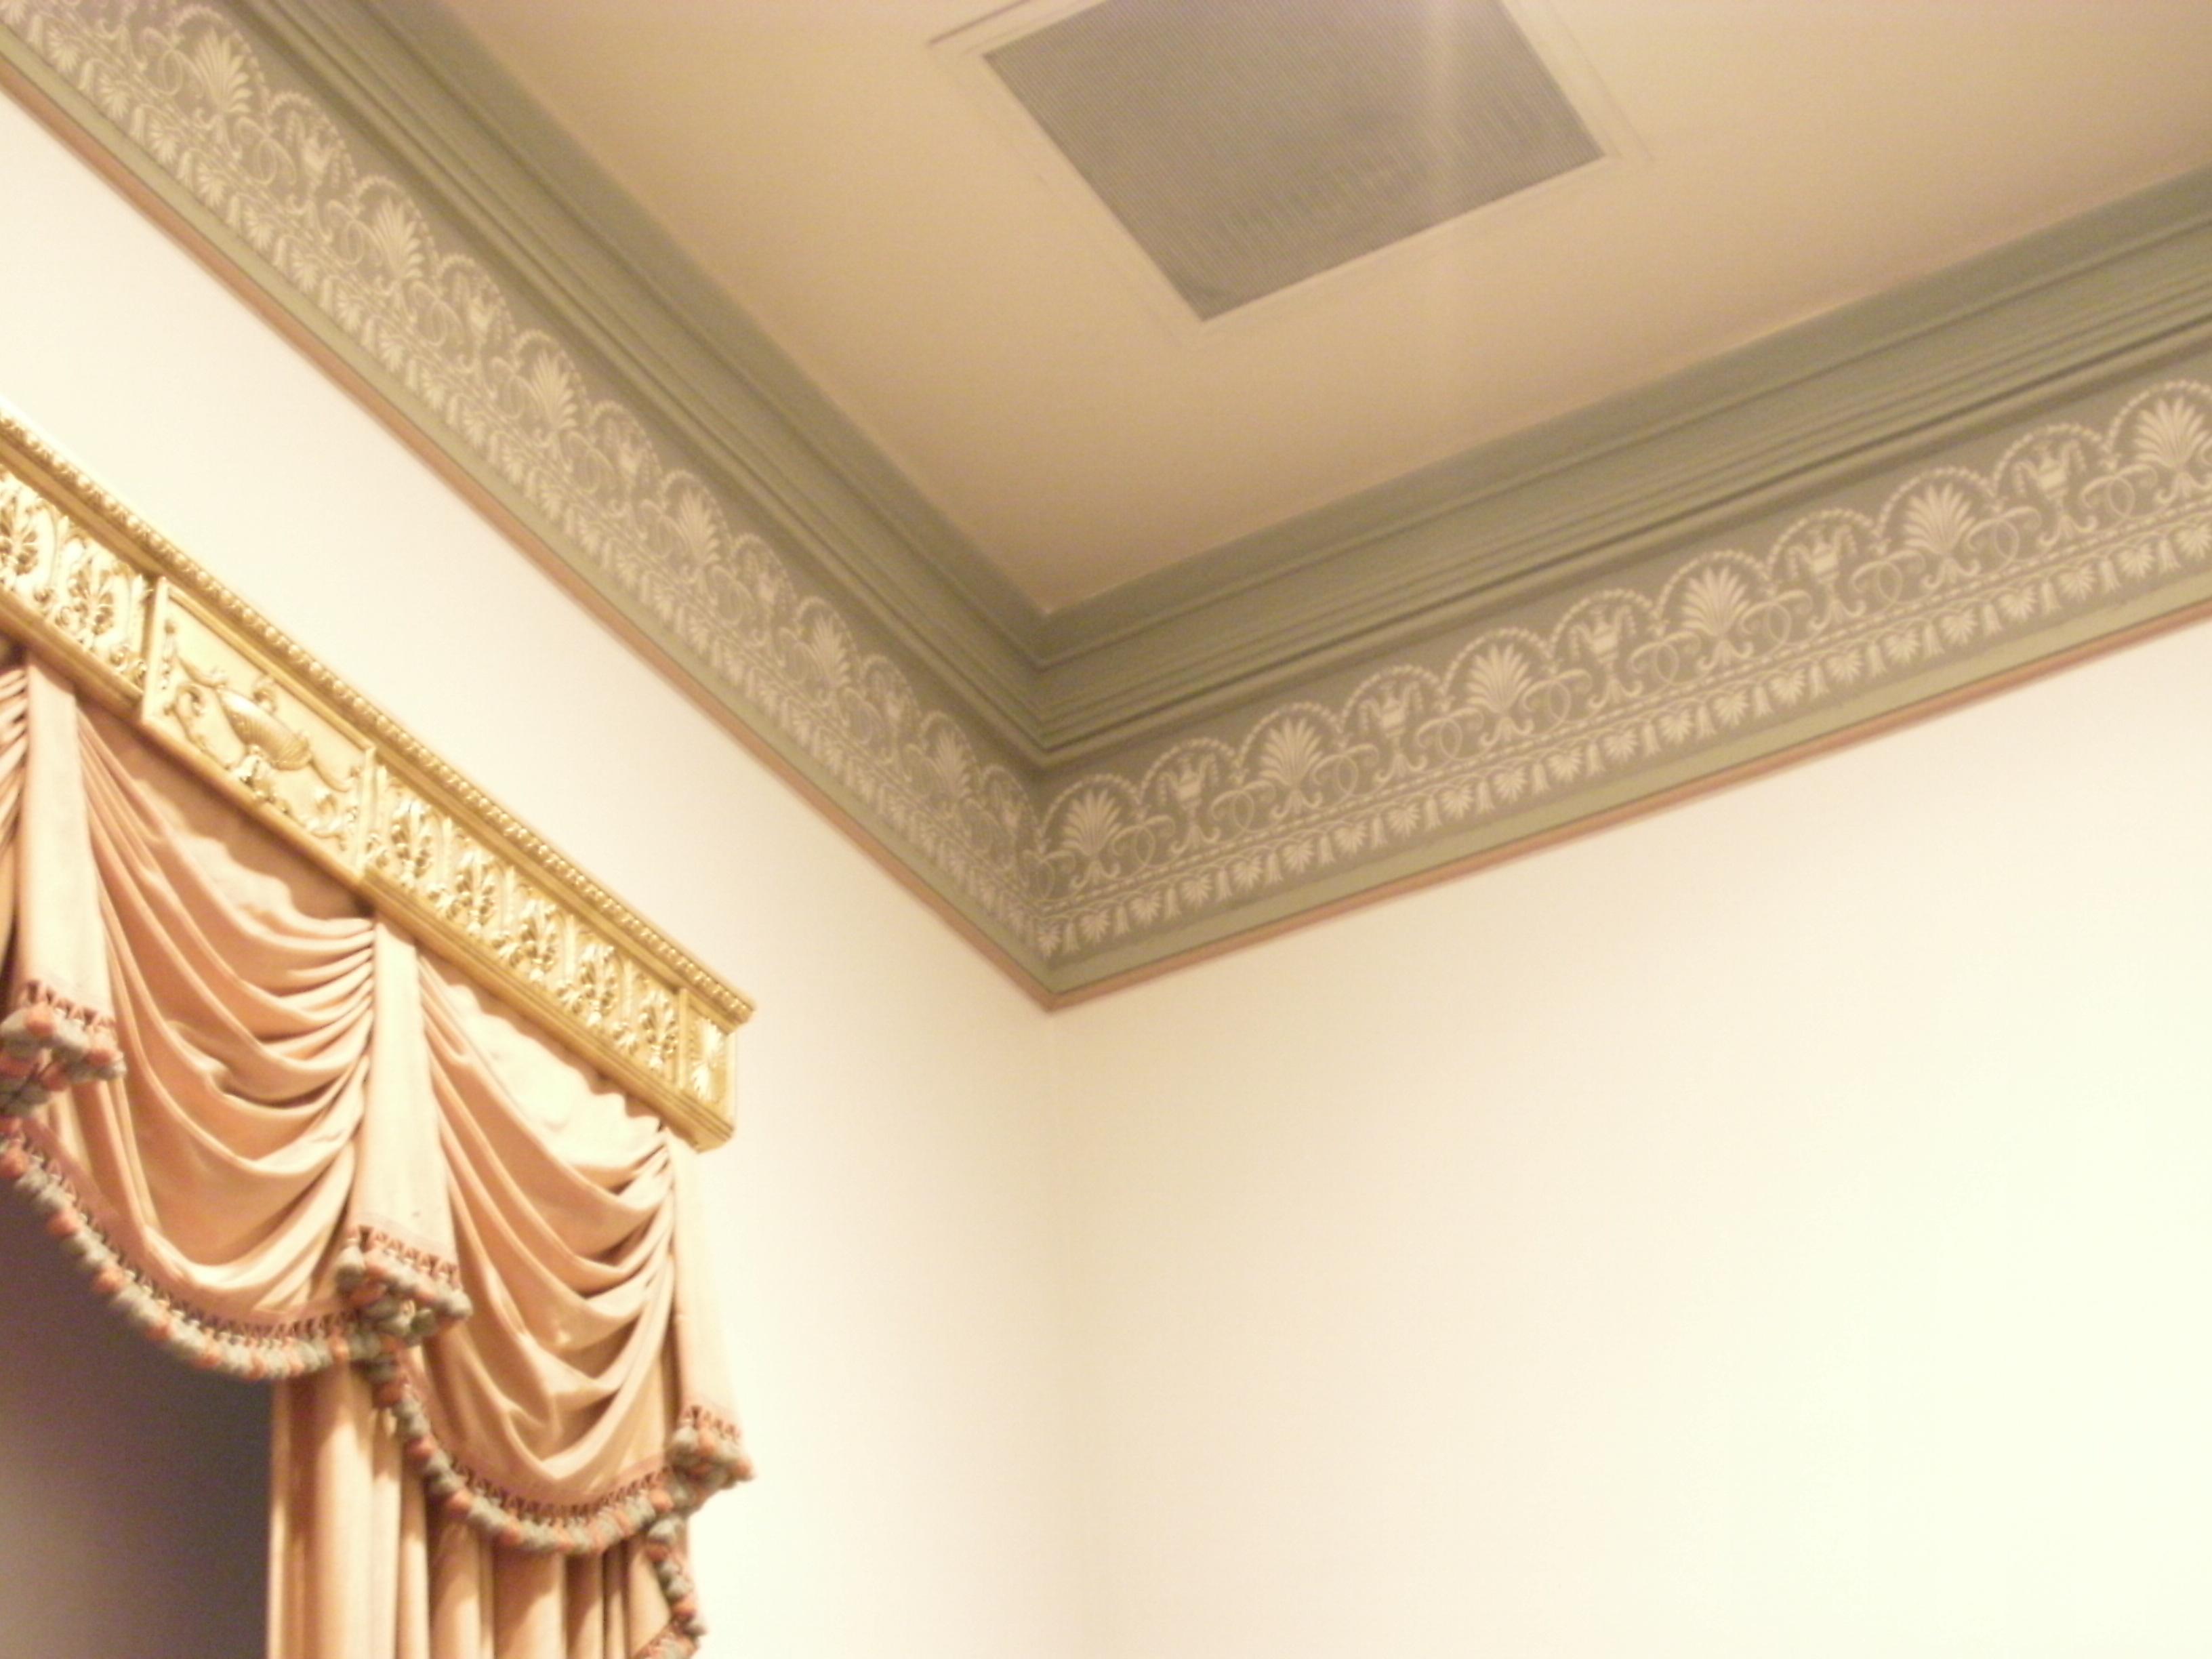 File:Lyceum - ceiling molding, Alexandria, VA.jpg